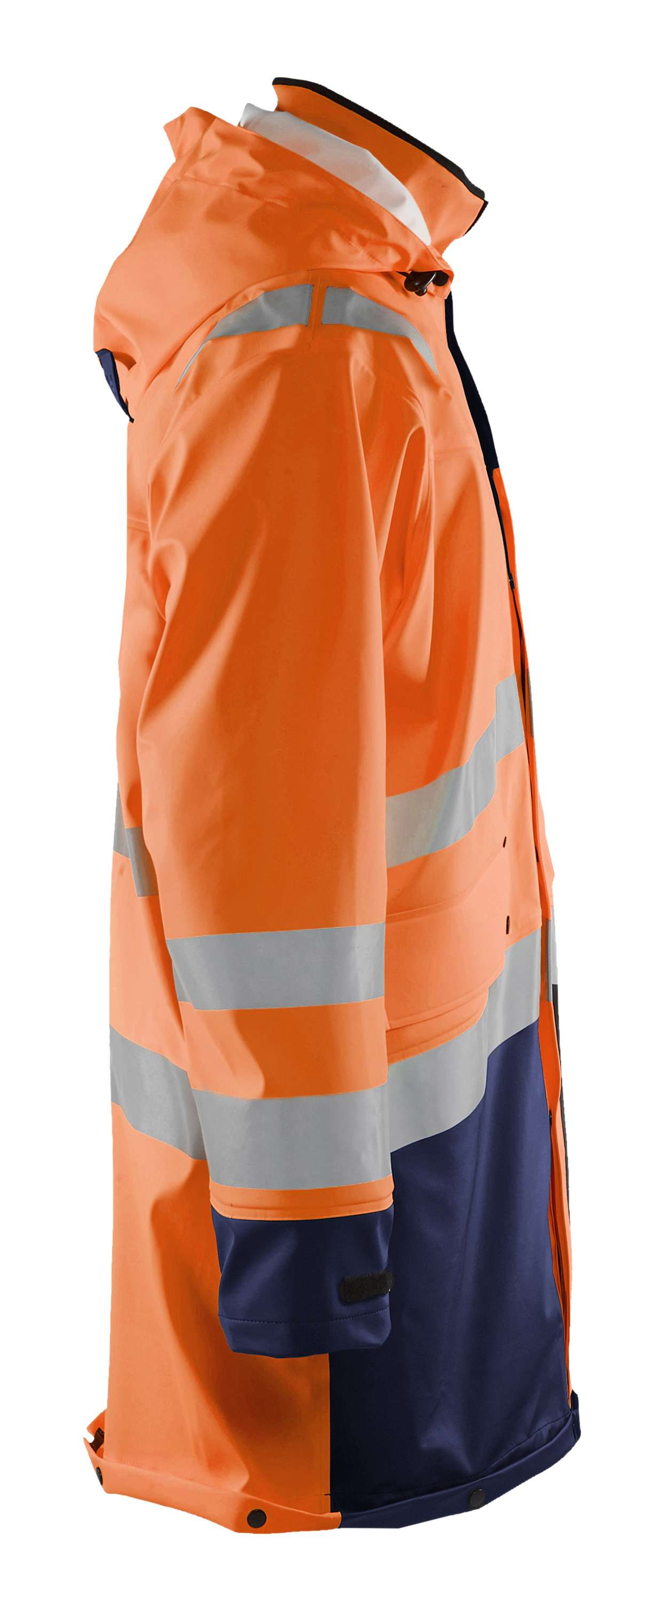 Blaklader Regenjassen 43262005 High Vis oranje-marineblauw(5389)